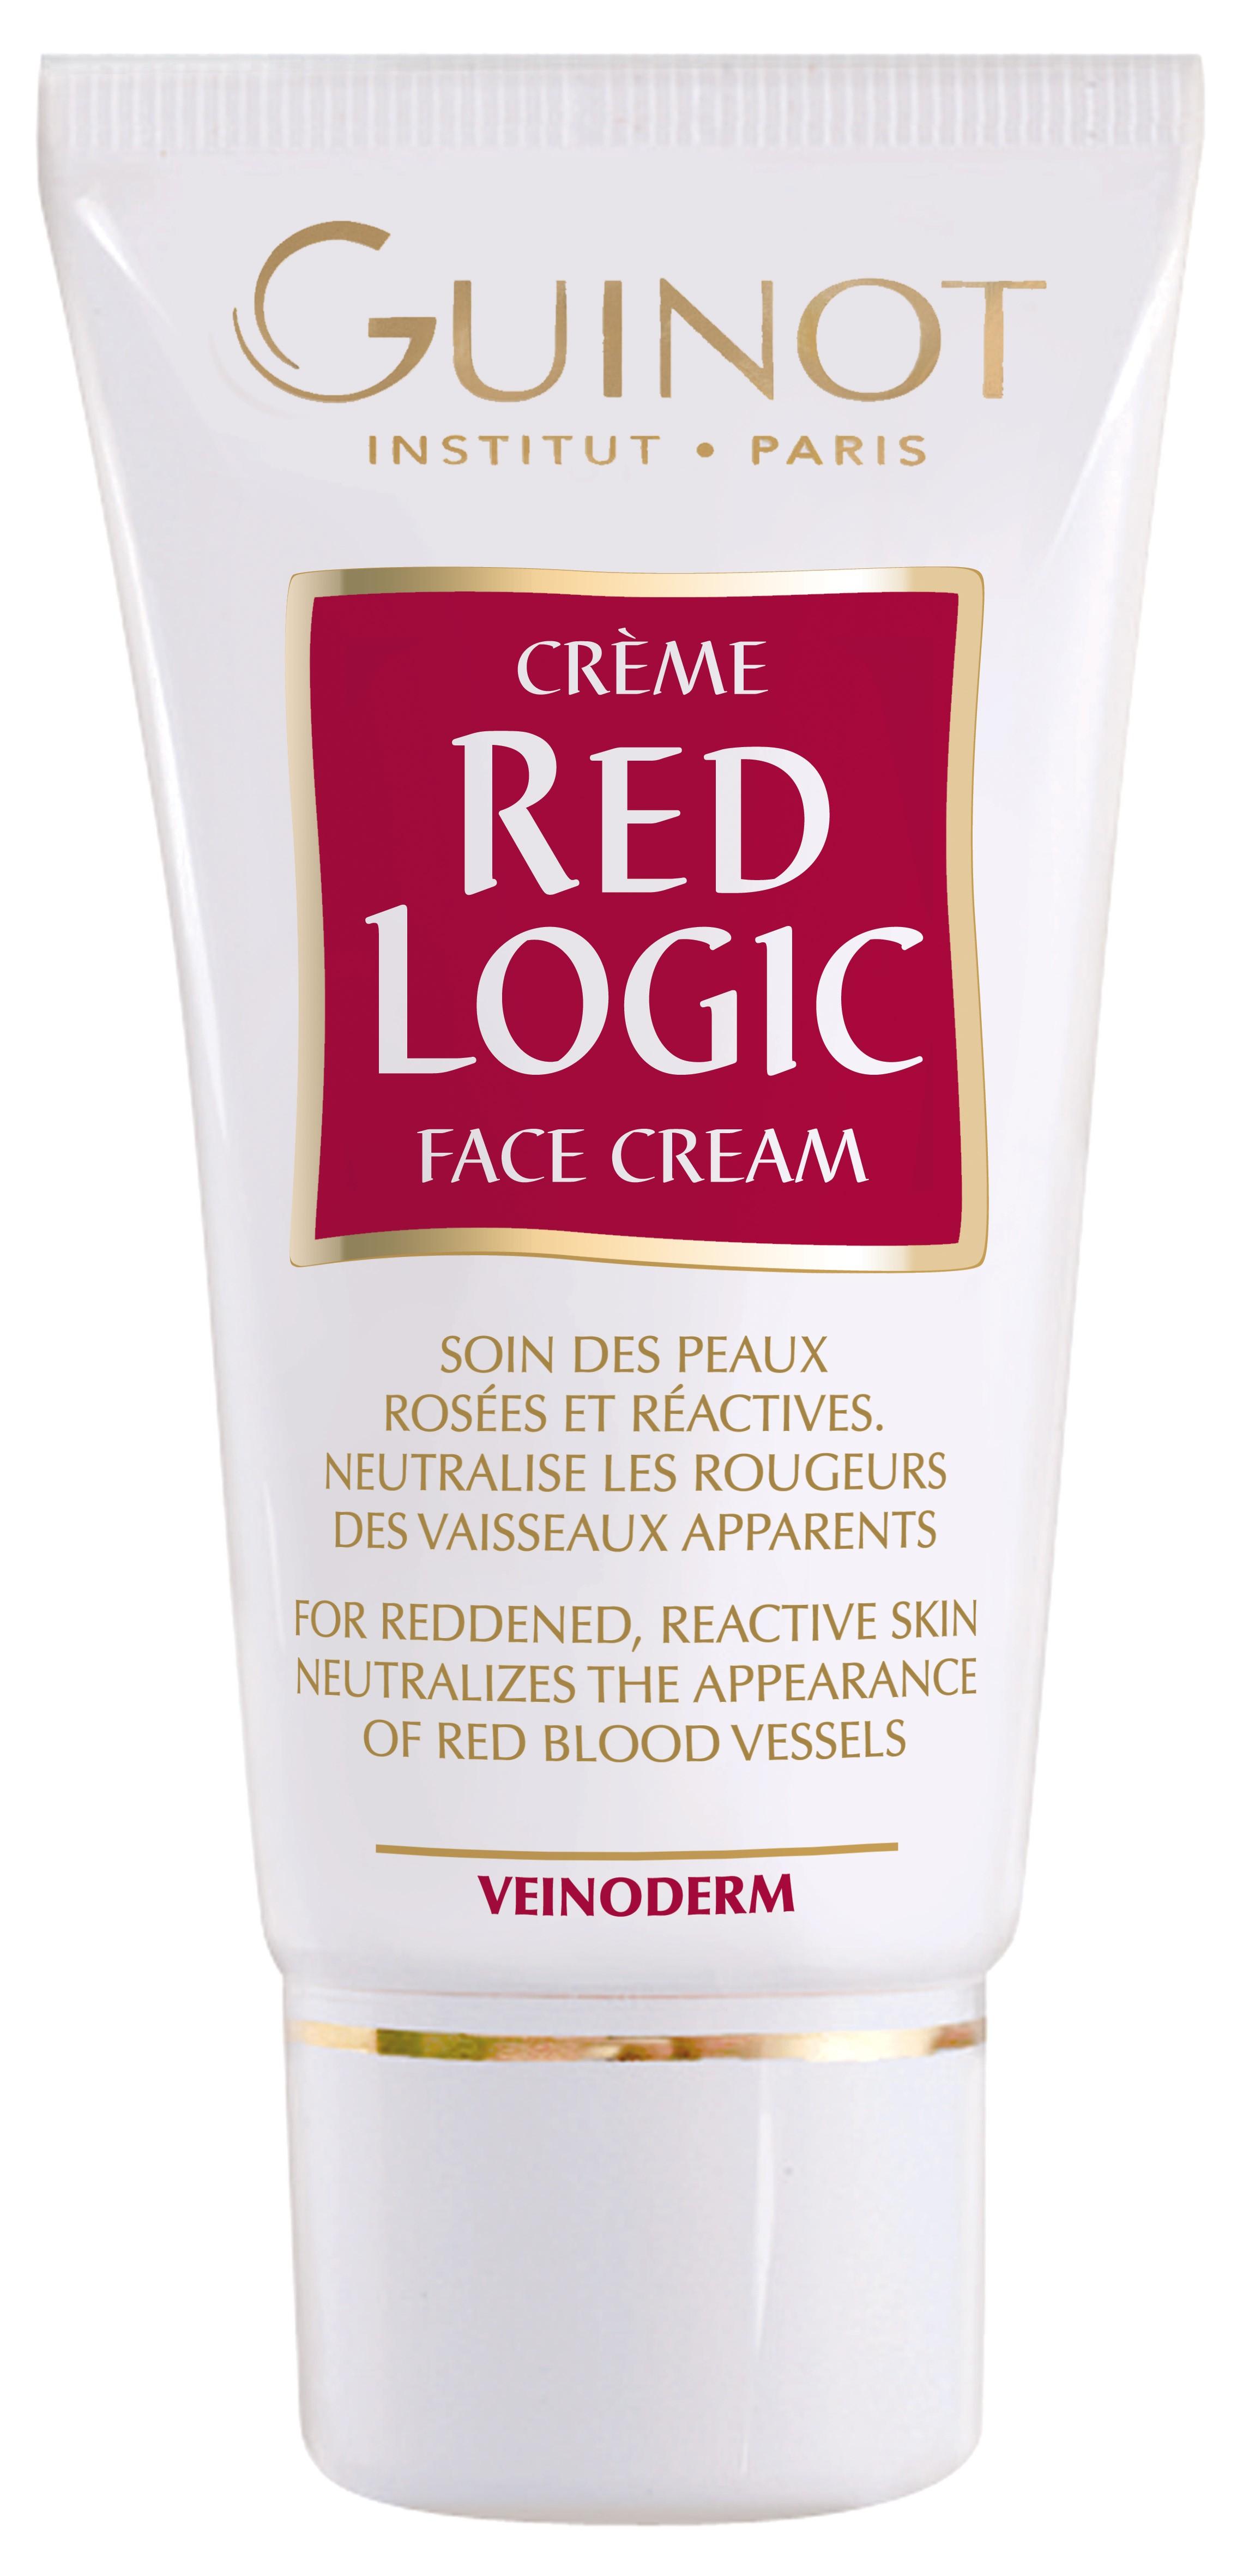 GUINOT Creme Red Logic, Face Cream Veinoderm, beruhigende Gesichtscreme, 30ml